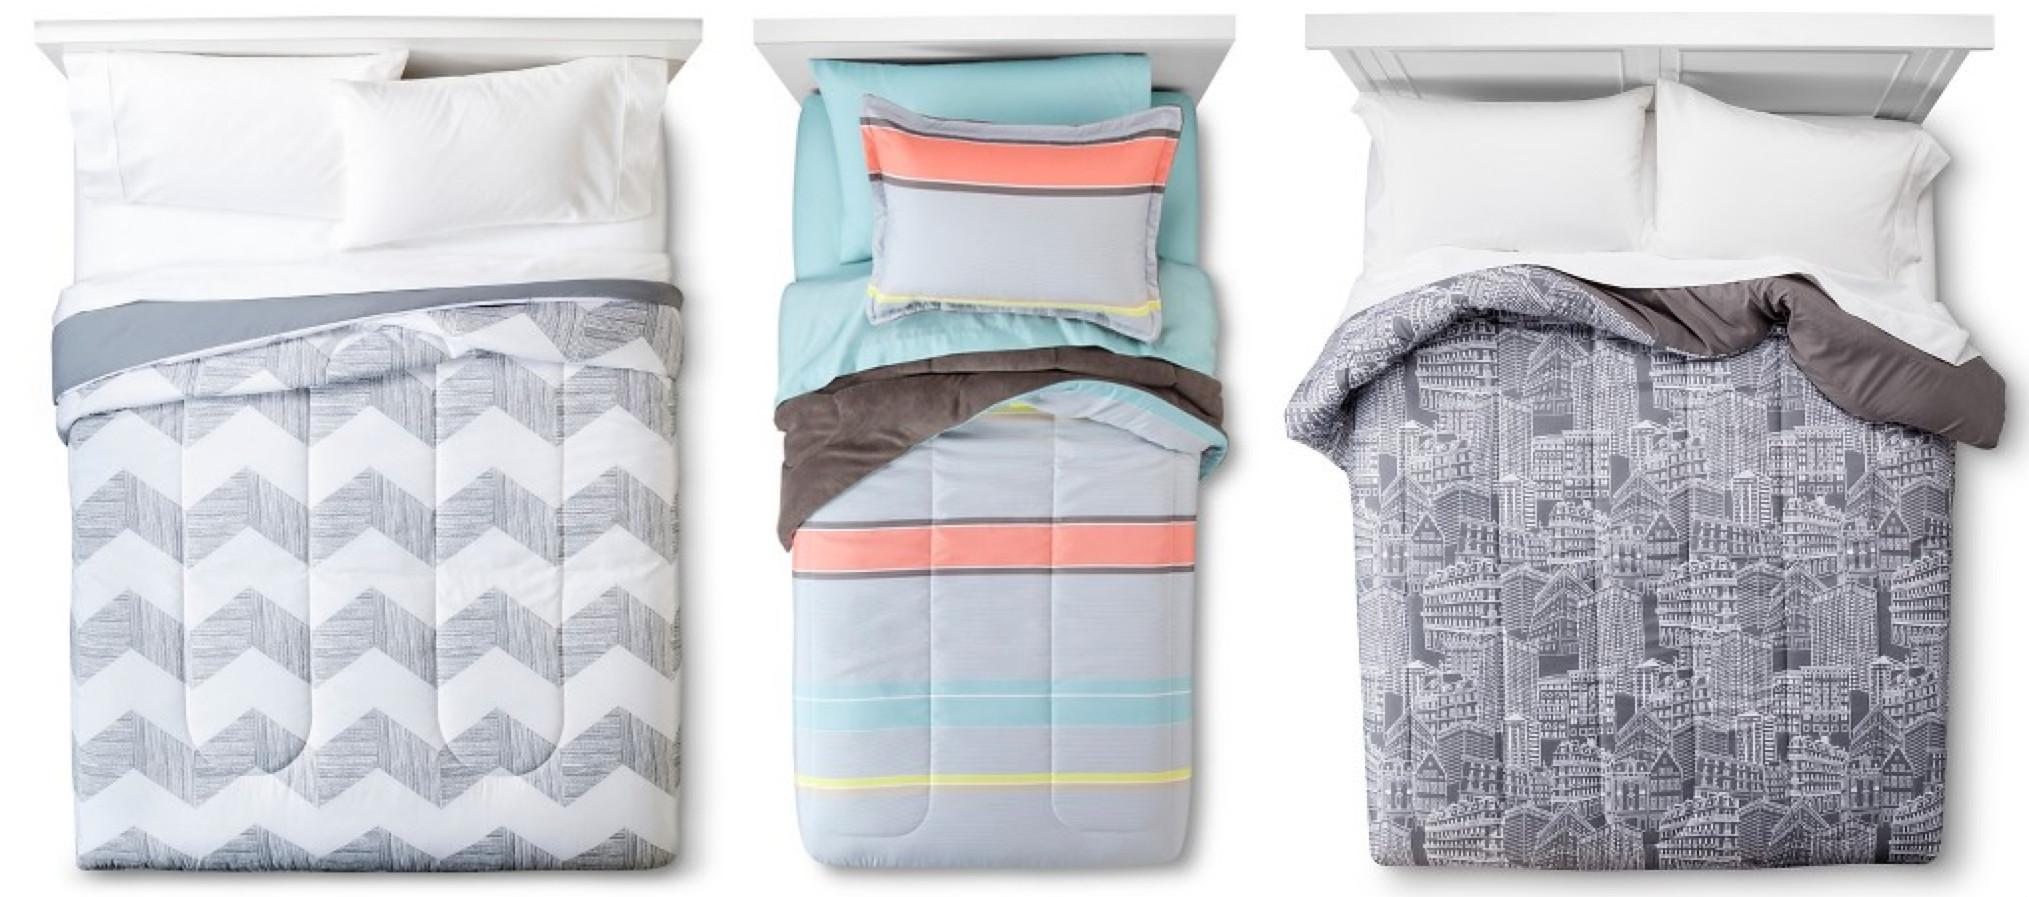 Target Com 5 98 Room Essentials Twin Xl Comforters Or 11 98 Bed